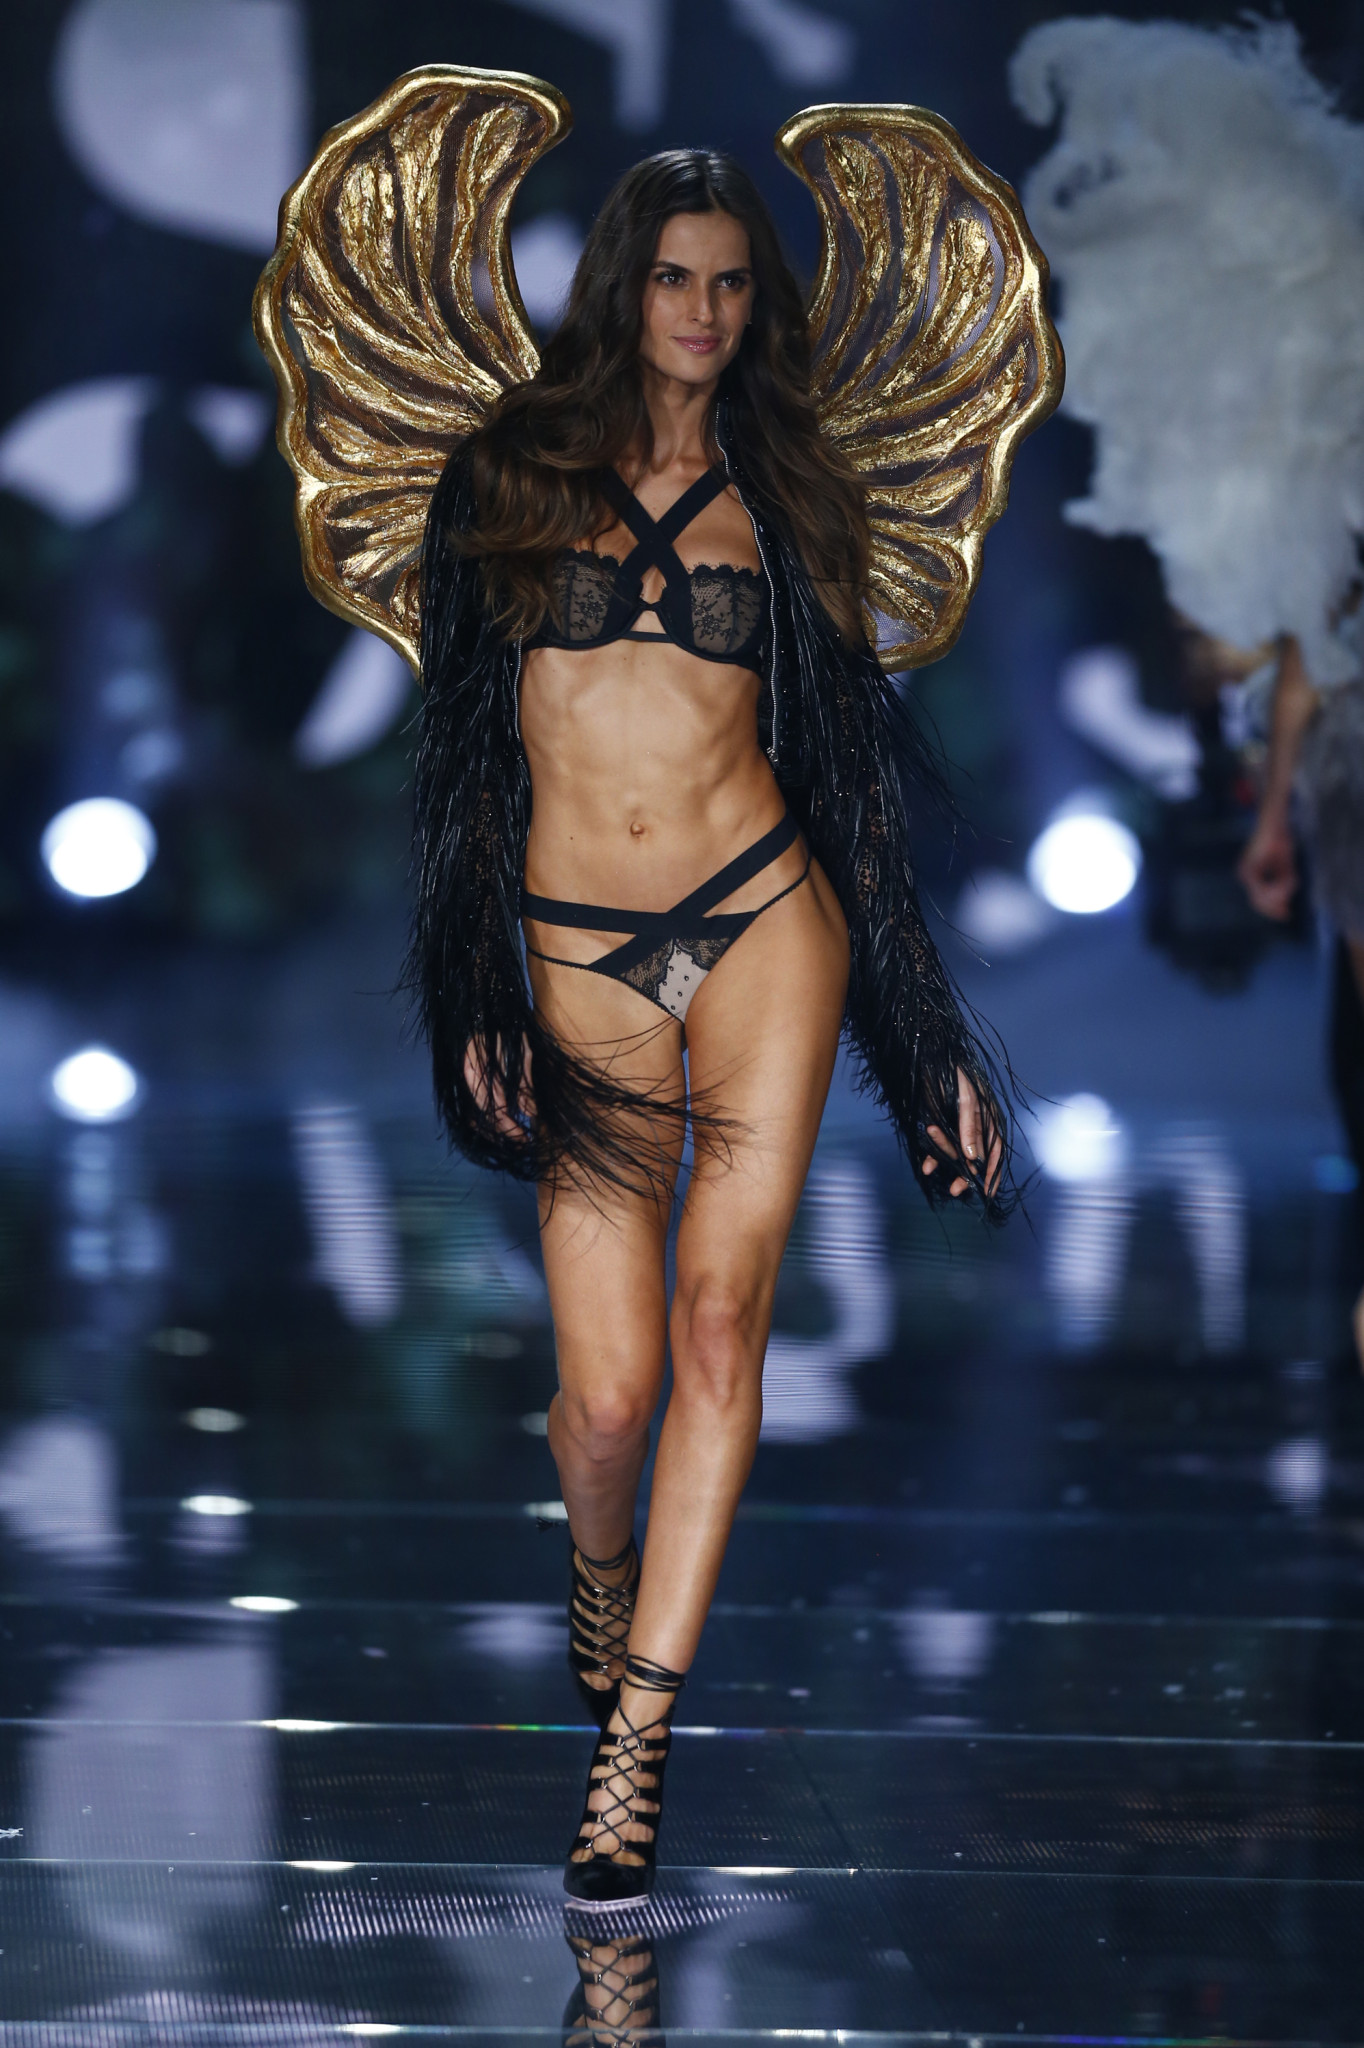 NEW YORK, NY - NOVEMBER 10: Model Izabel Goulart walks the runway during the 2015 Victoria's Secret Fashion Show at Lexington Avenue Armory on November 10, 2015 in New York City.